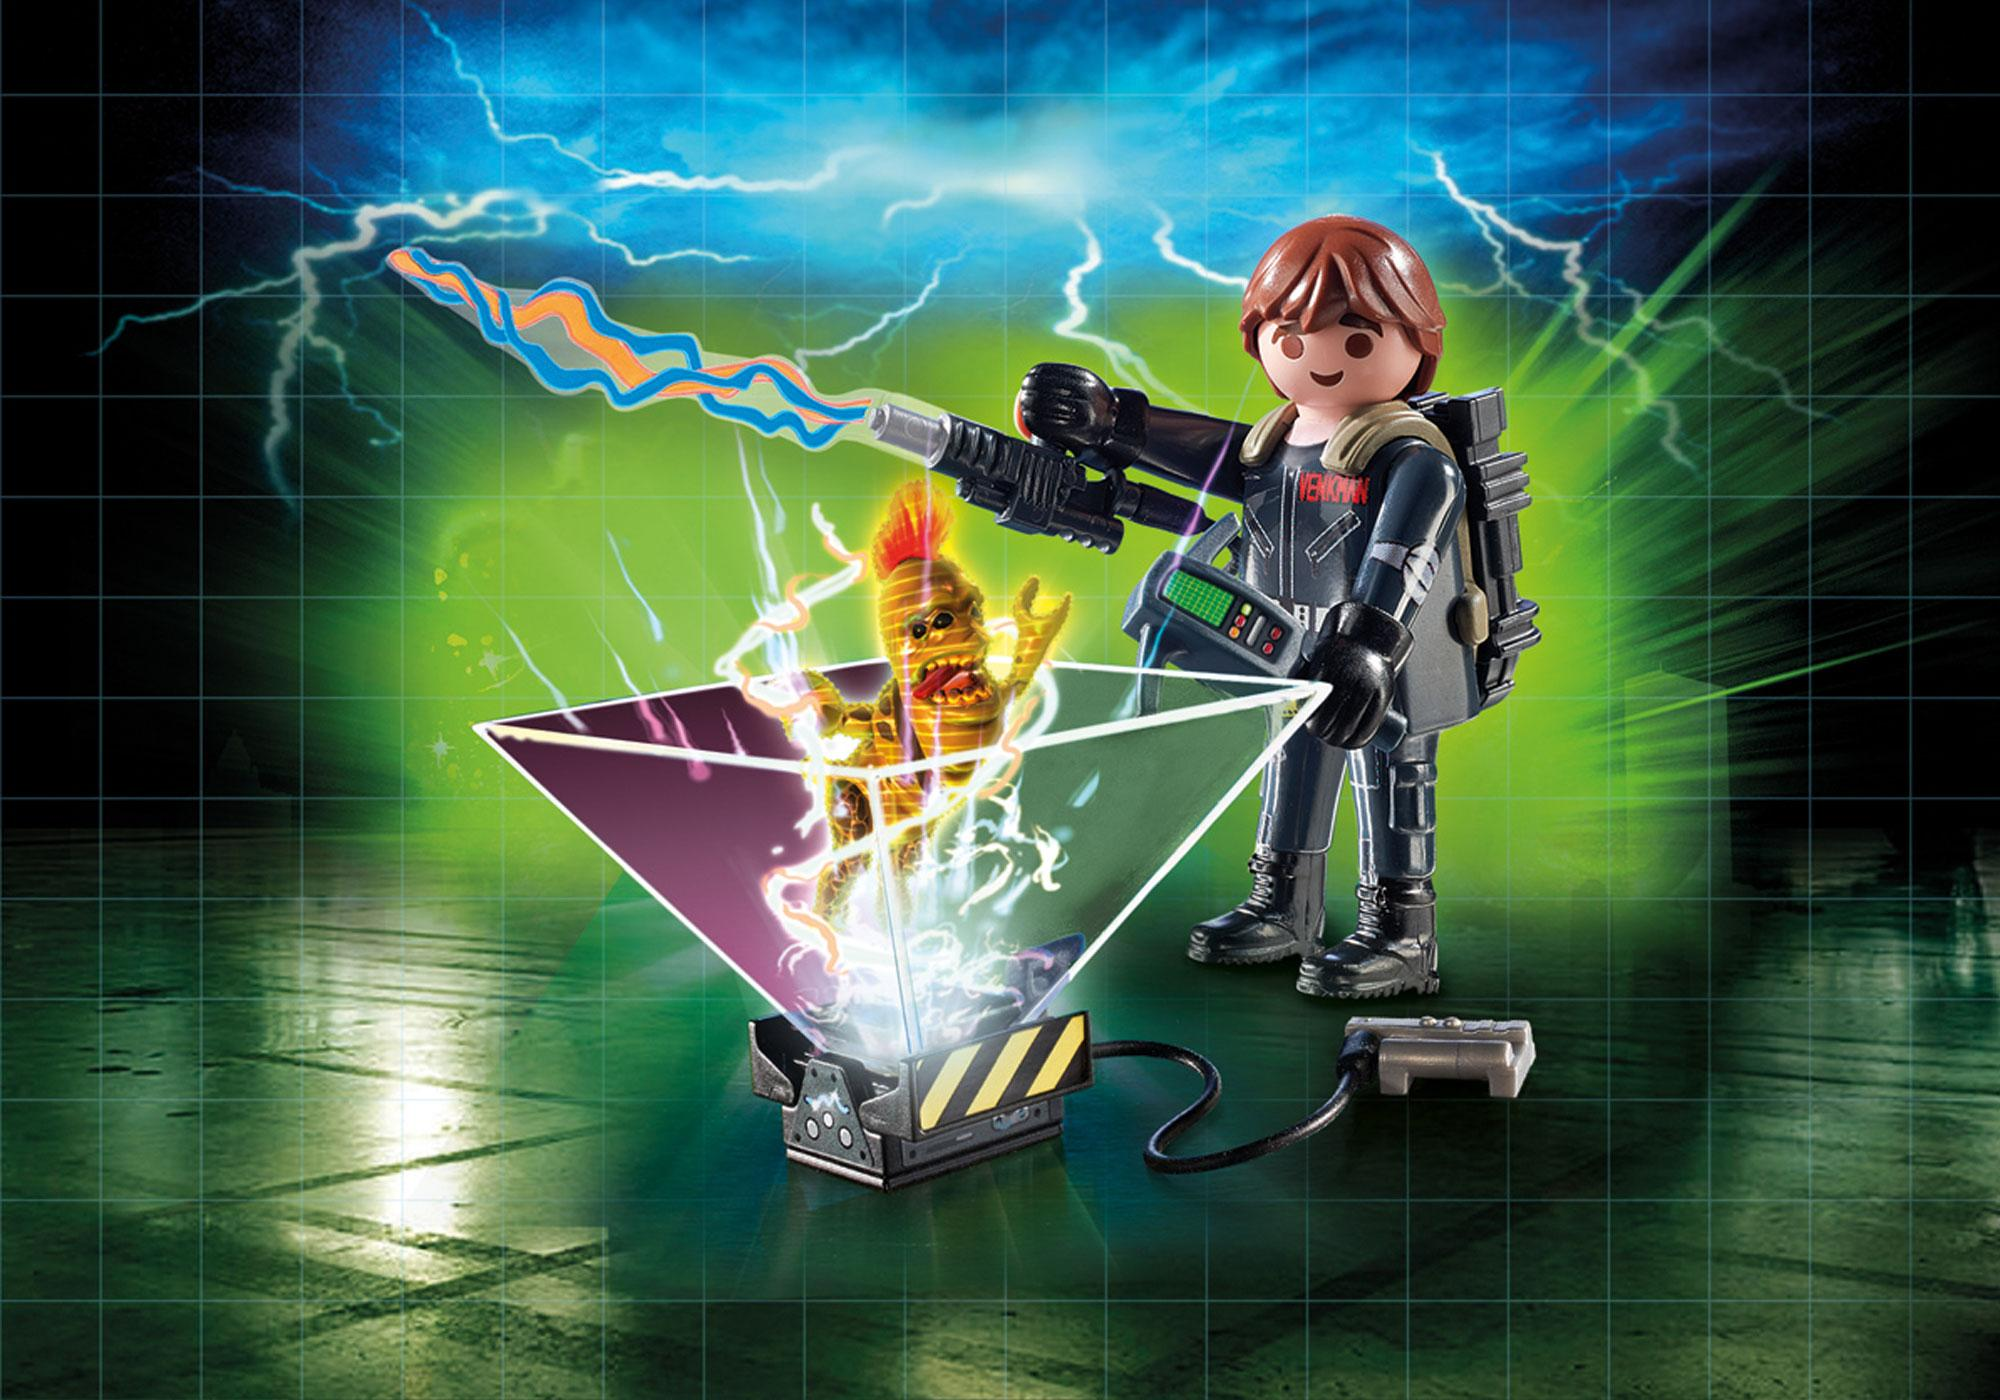 http://media.playmobil.com/i/playmobil/9347_product_detail/Ghostbuster Peter Venkman